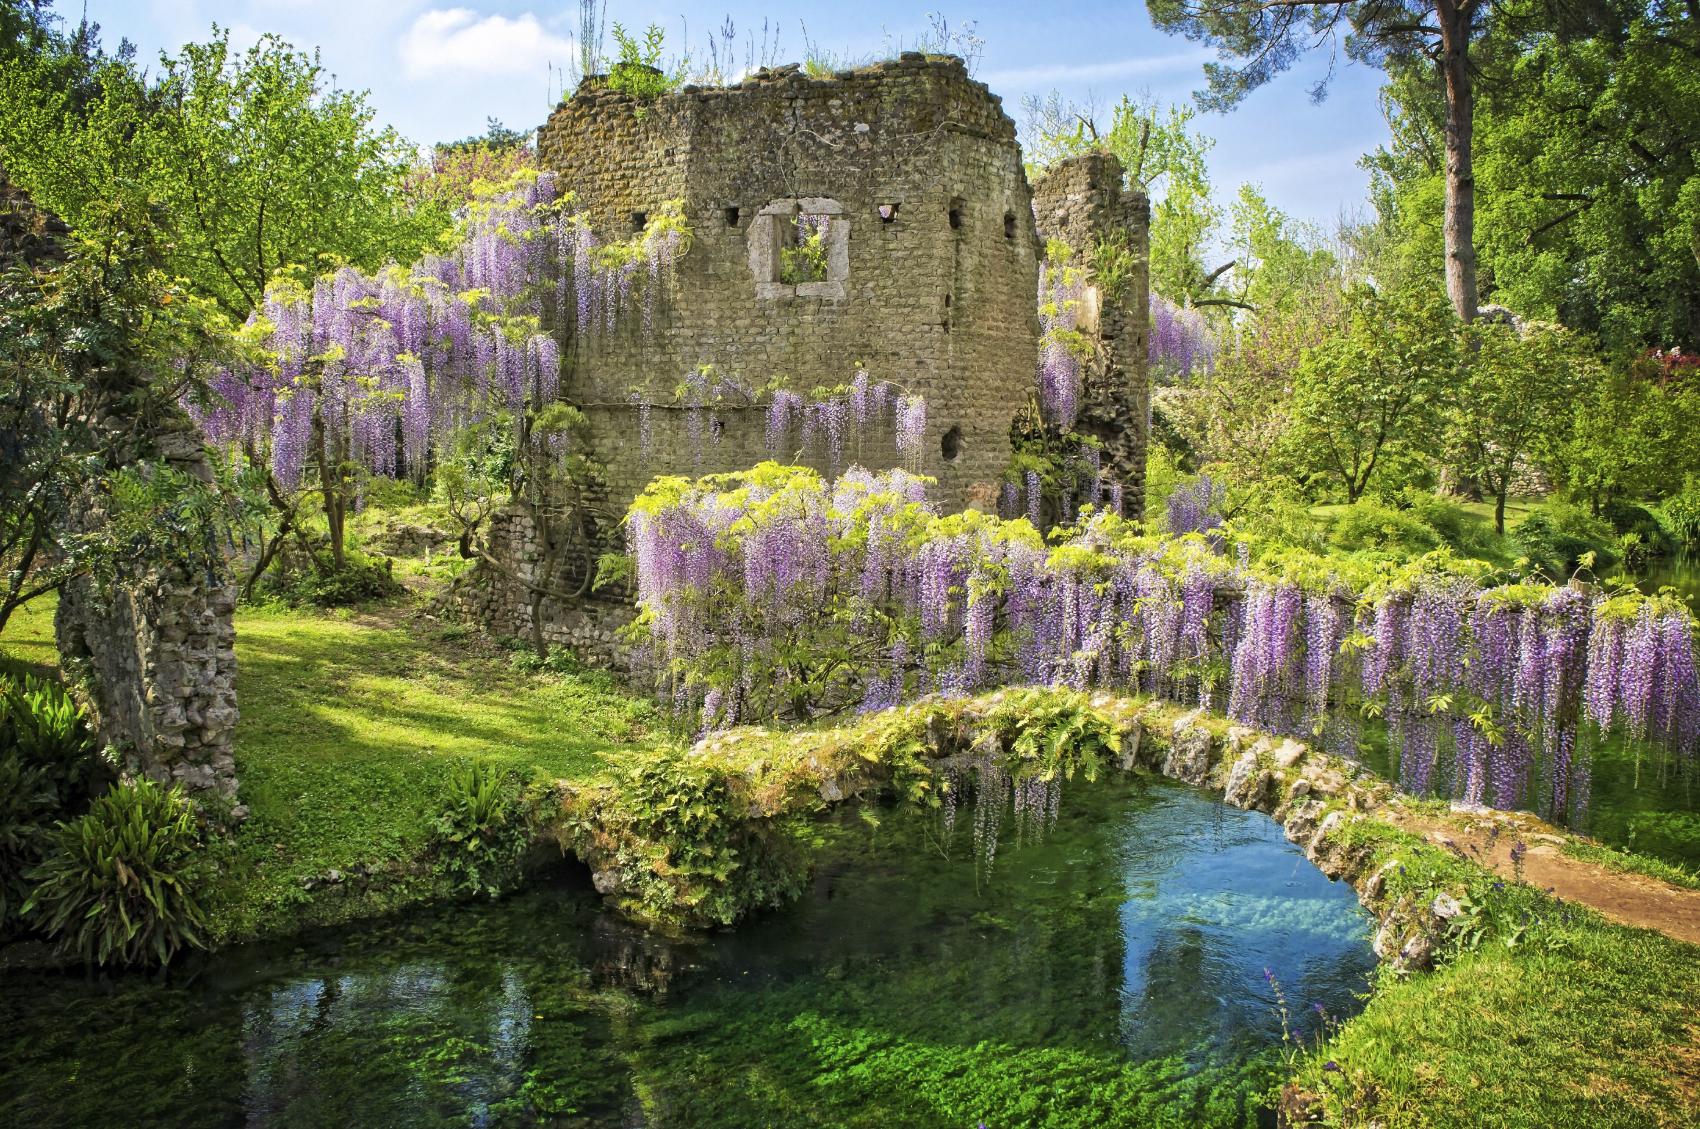 Róma-utazási tanácsok - Index Fórum, I giardini di ninfa sito ufficiale